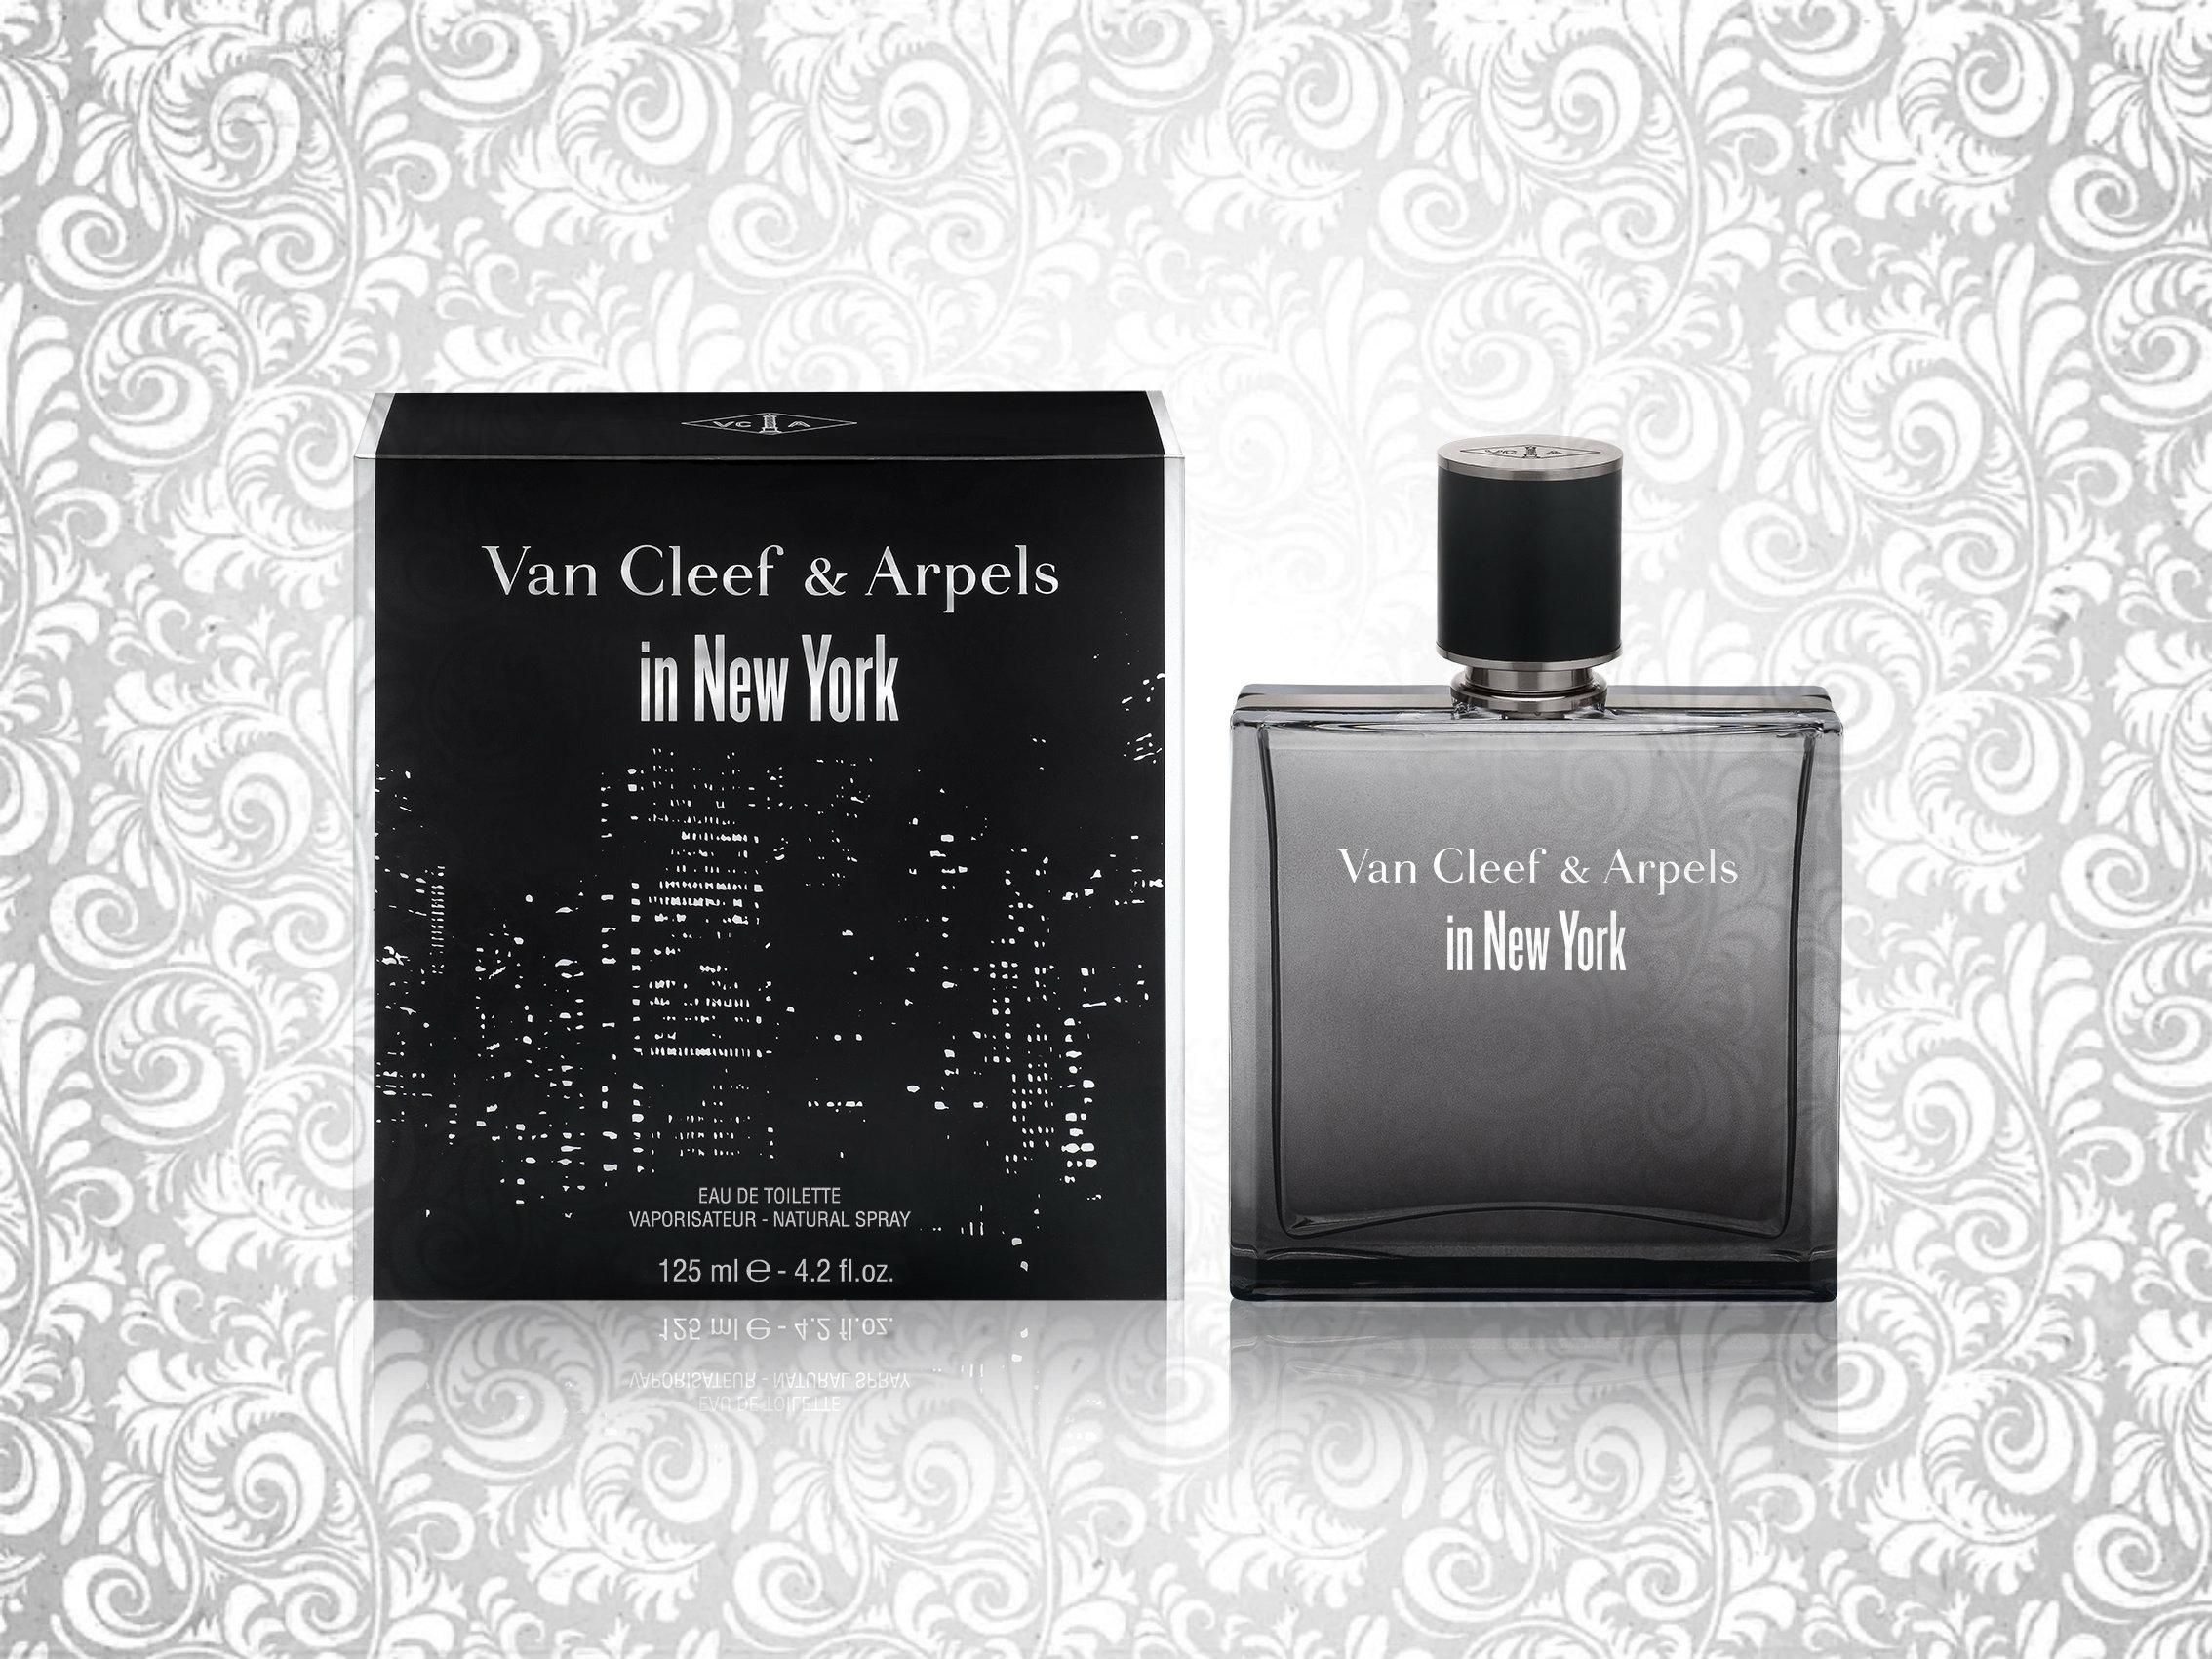 Van Cleef & Arpels представил новый мужской аромат In New York